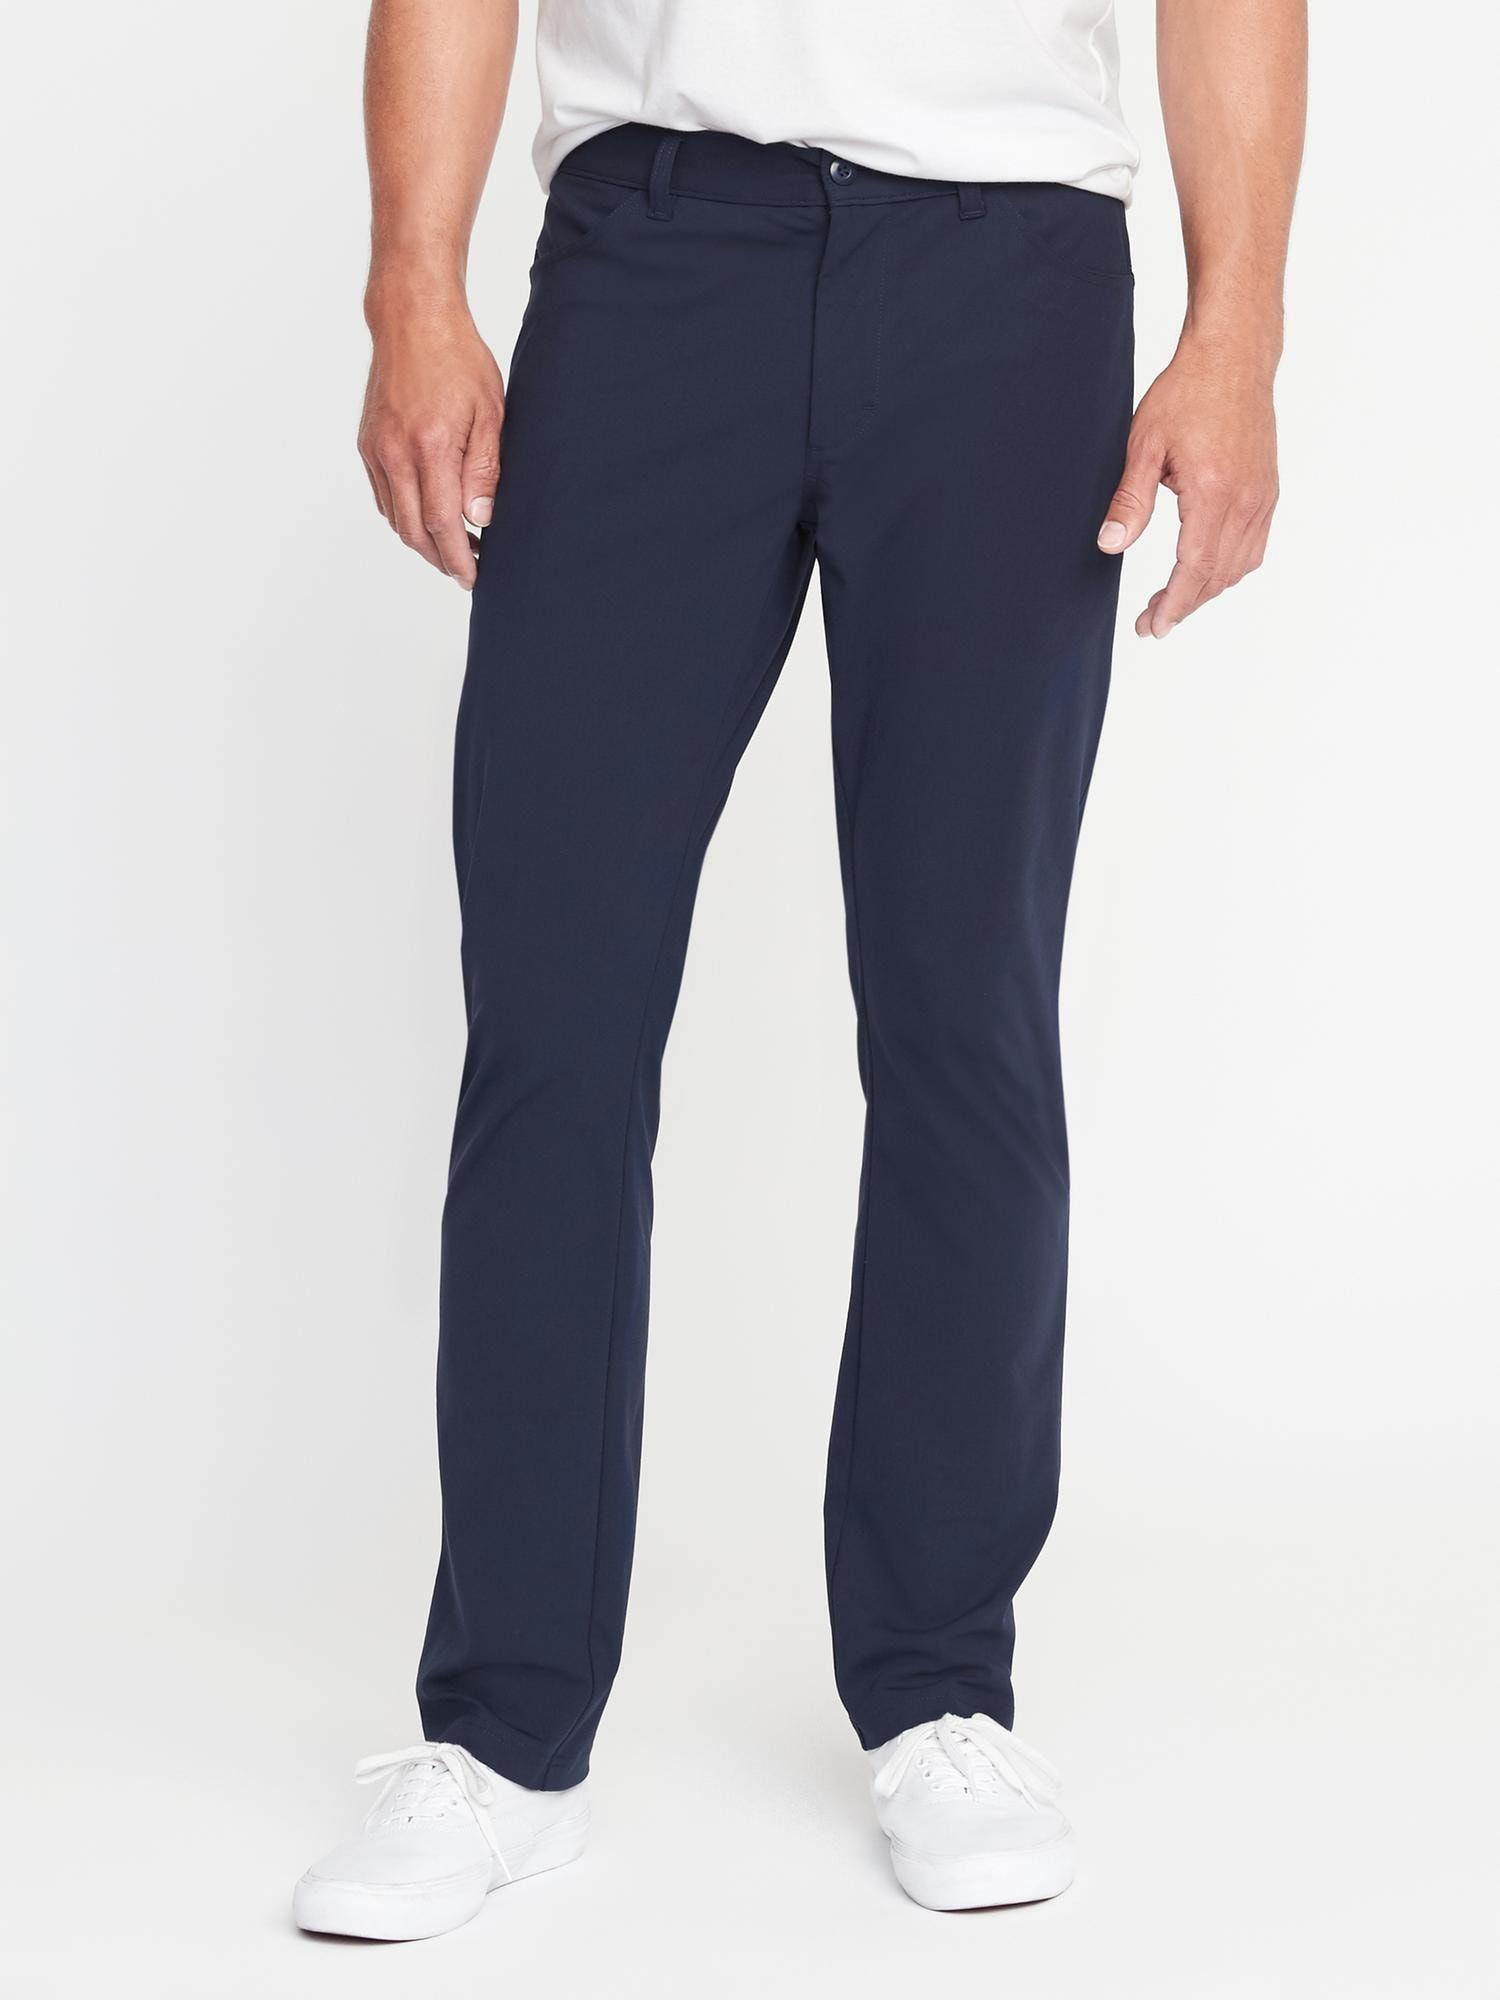 30+ Old navy dress pants ideas info